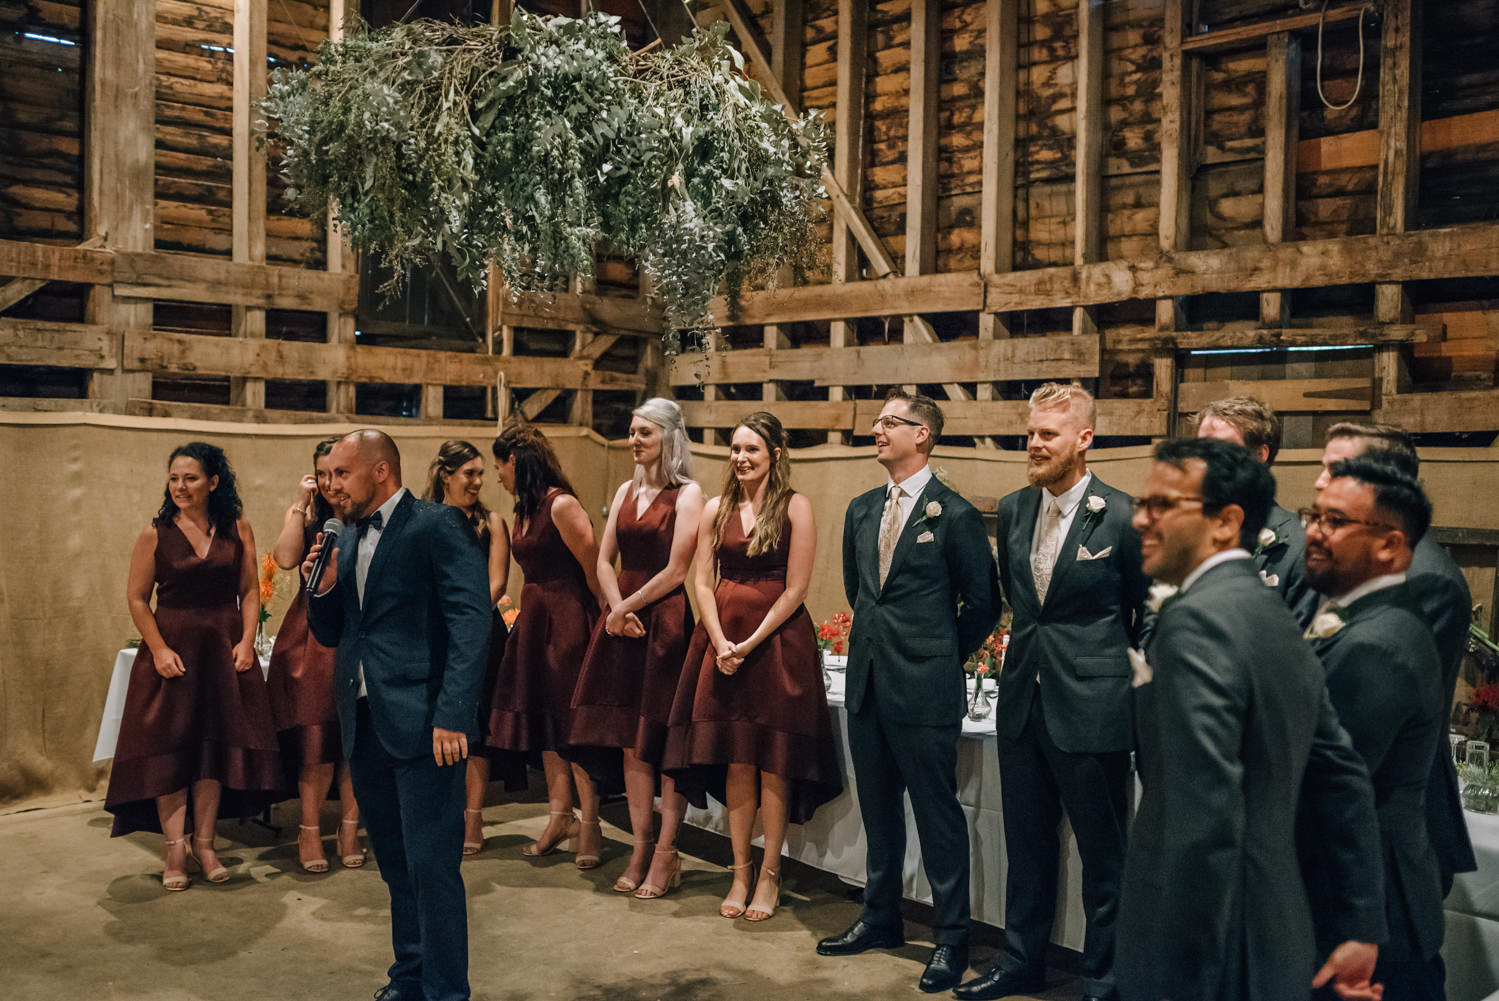 Brickendon-Wedding-Photographer-128.jpg